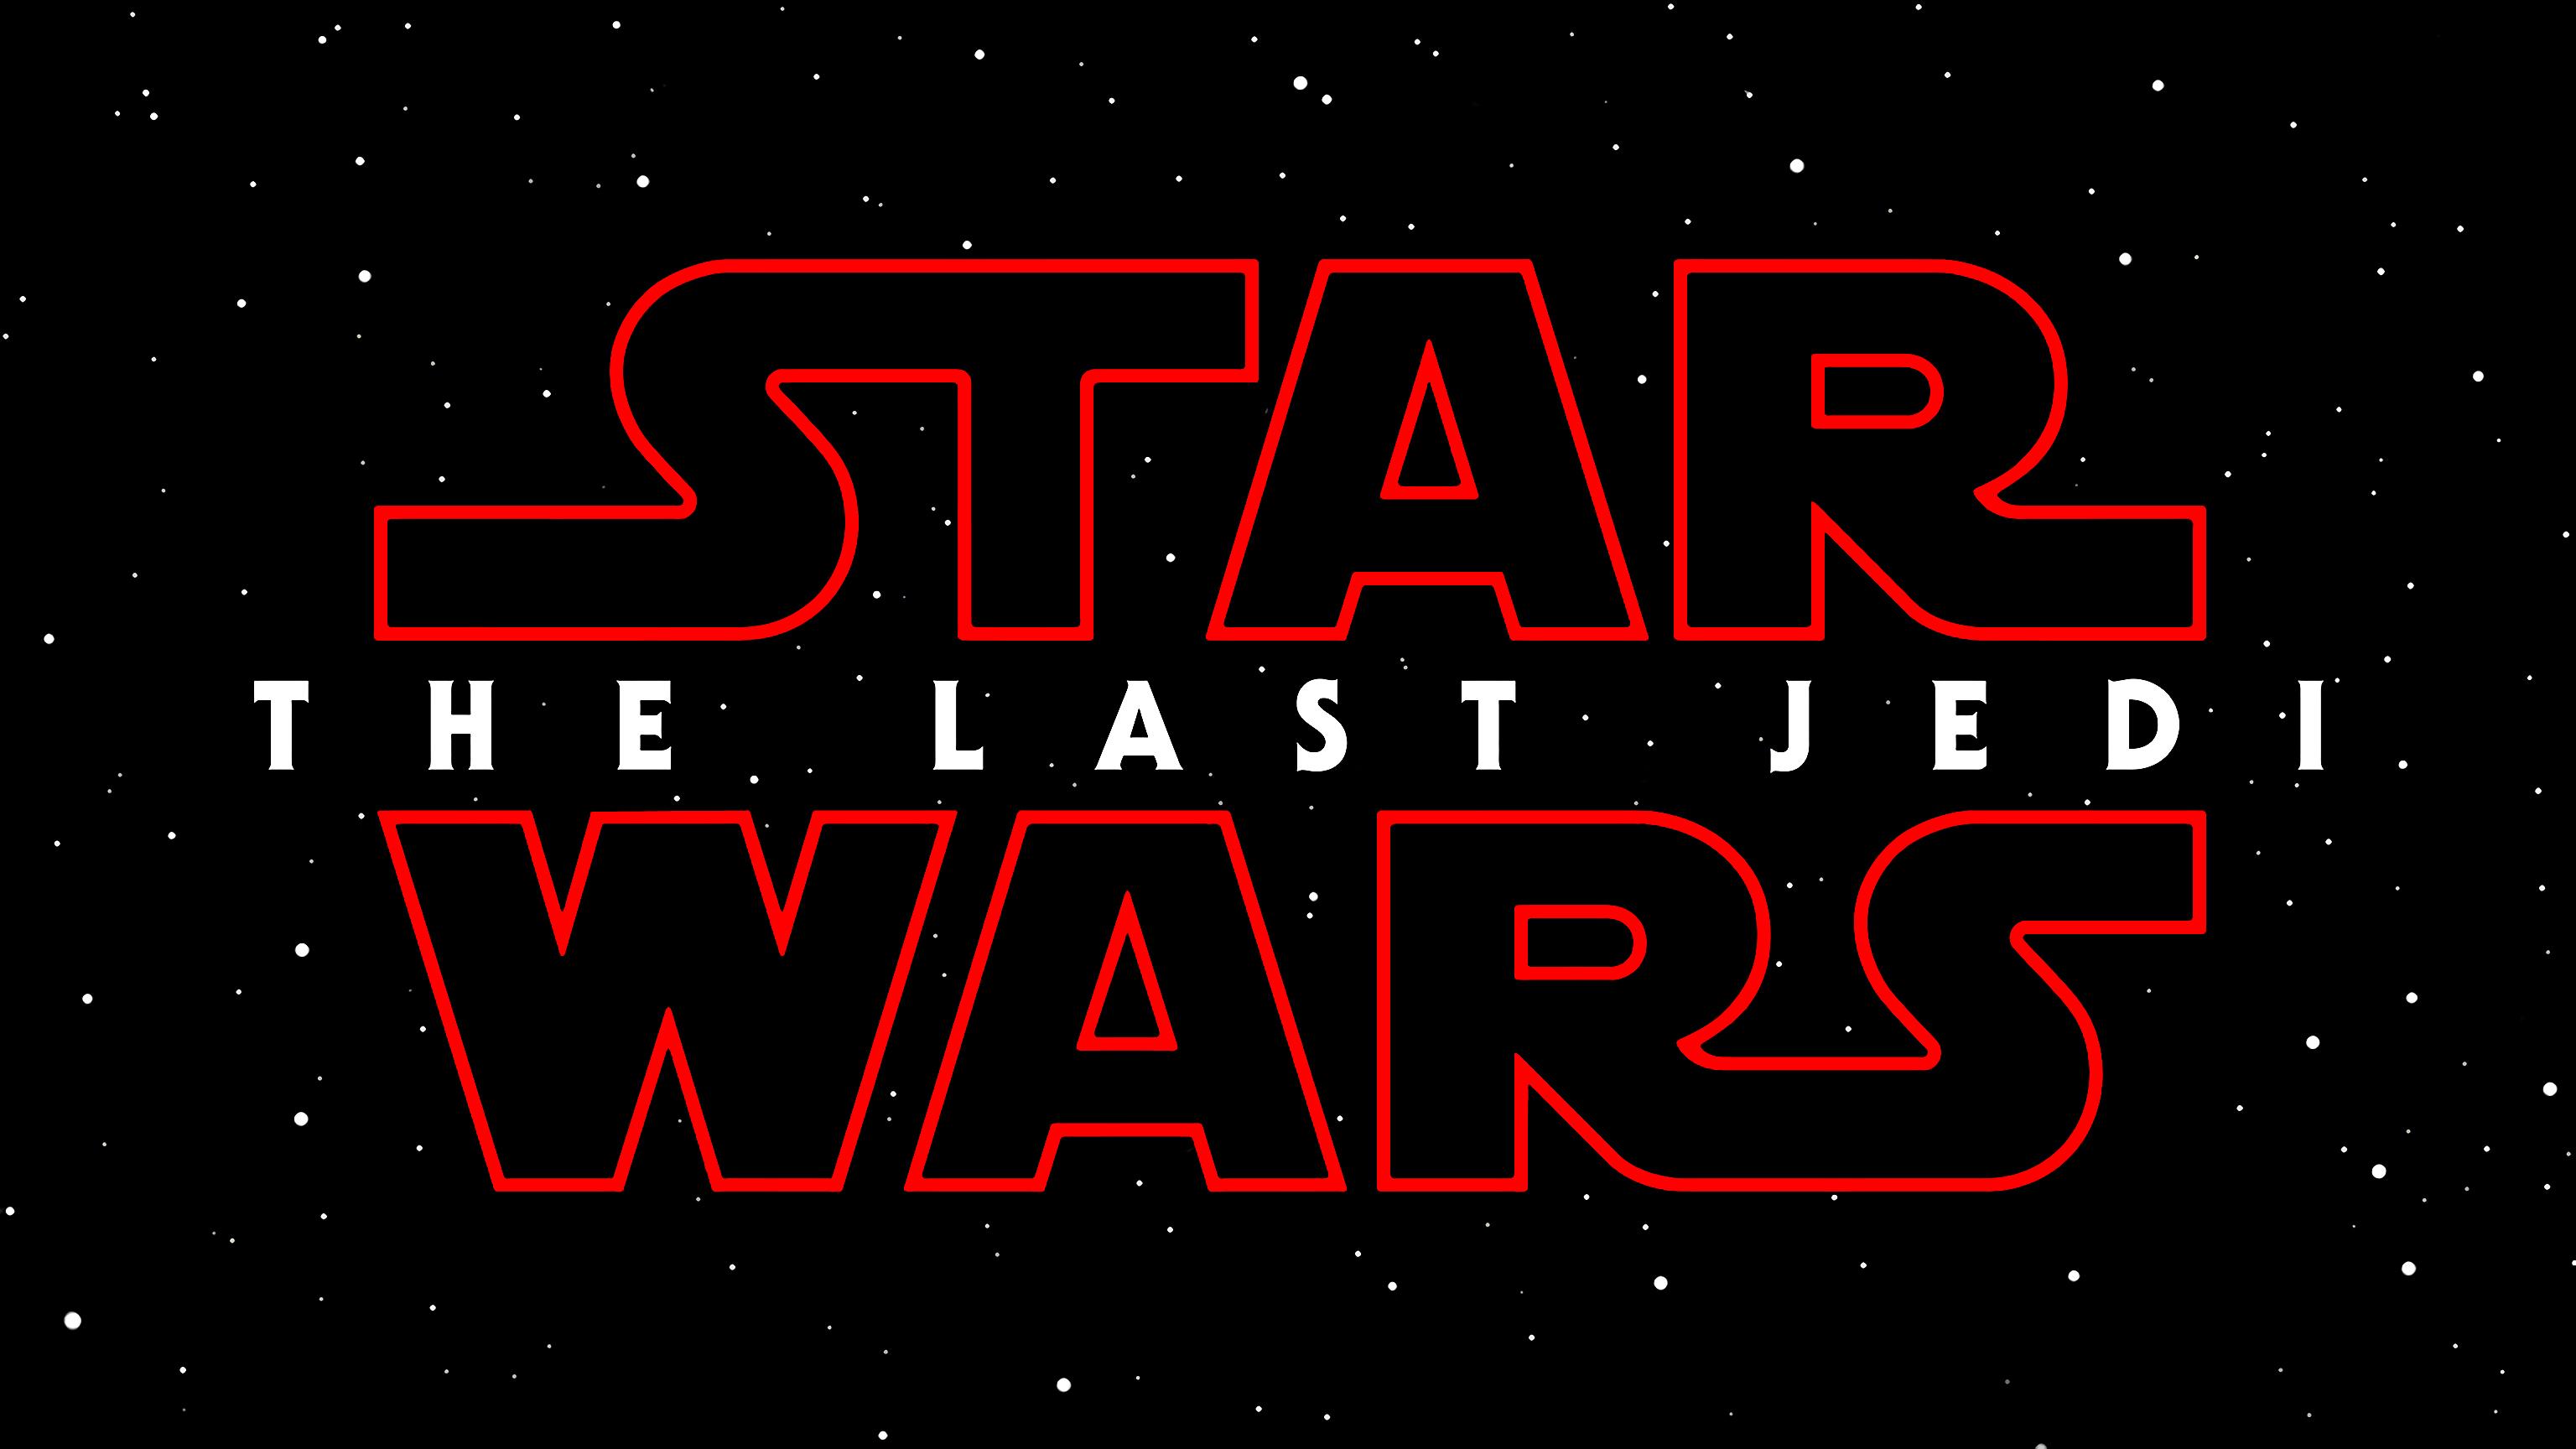 Star Wars The Last Jedi Logo Wallpaper Background 62372